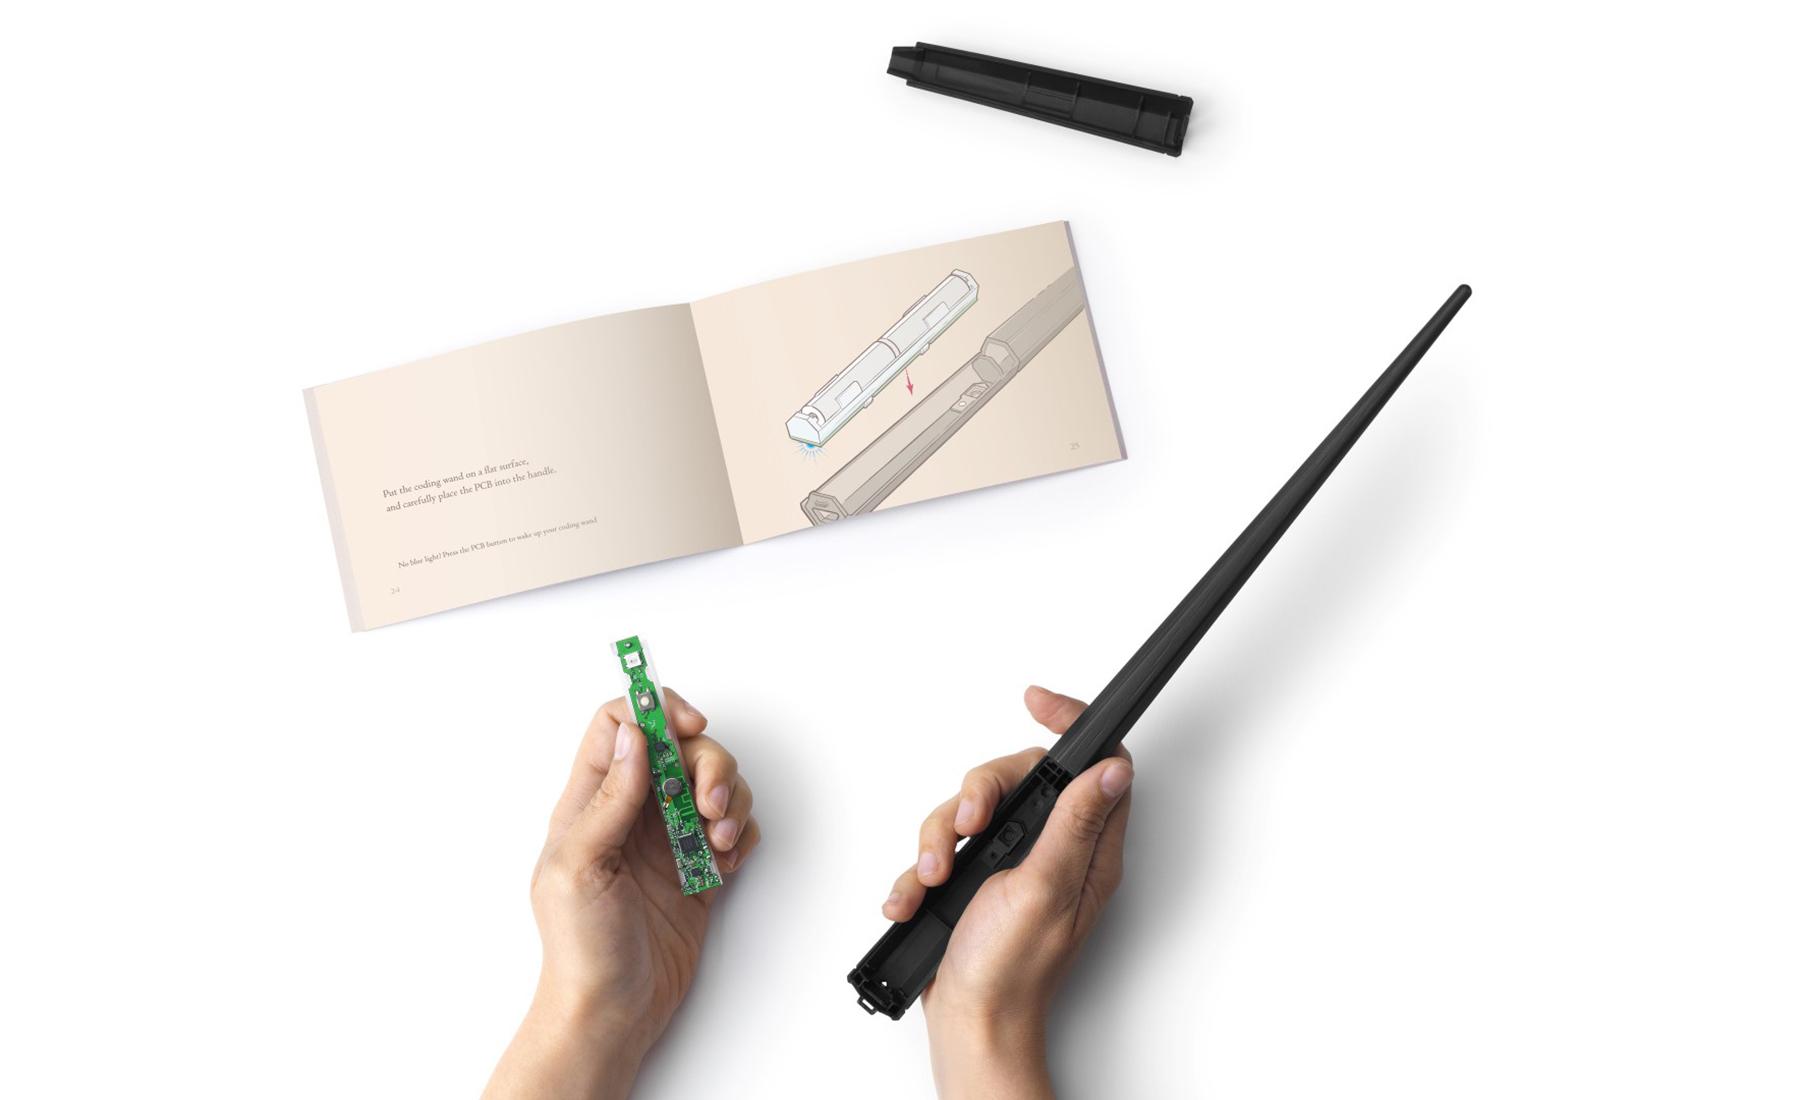 Kano's next coding kit is a Harry Potter wand